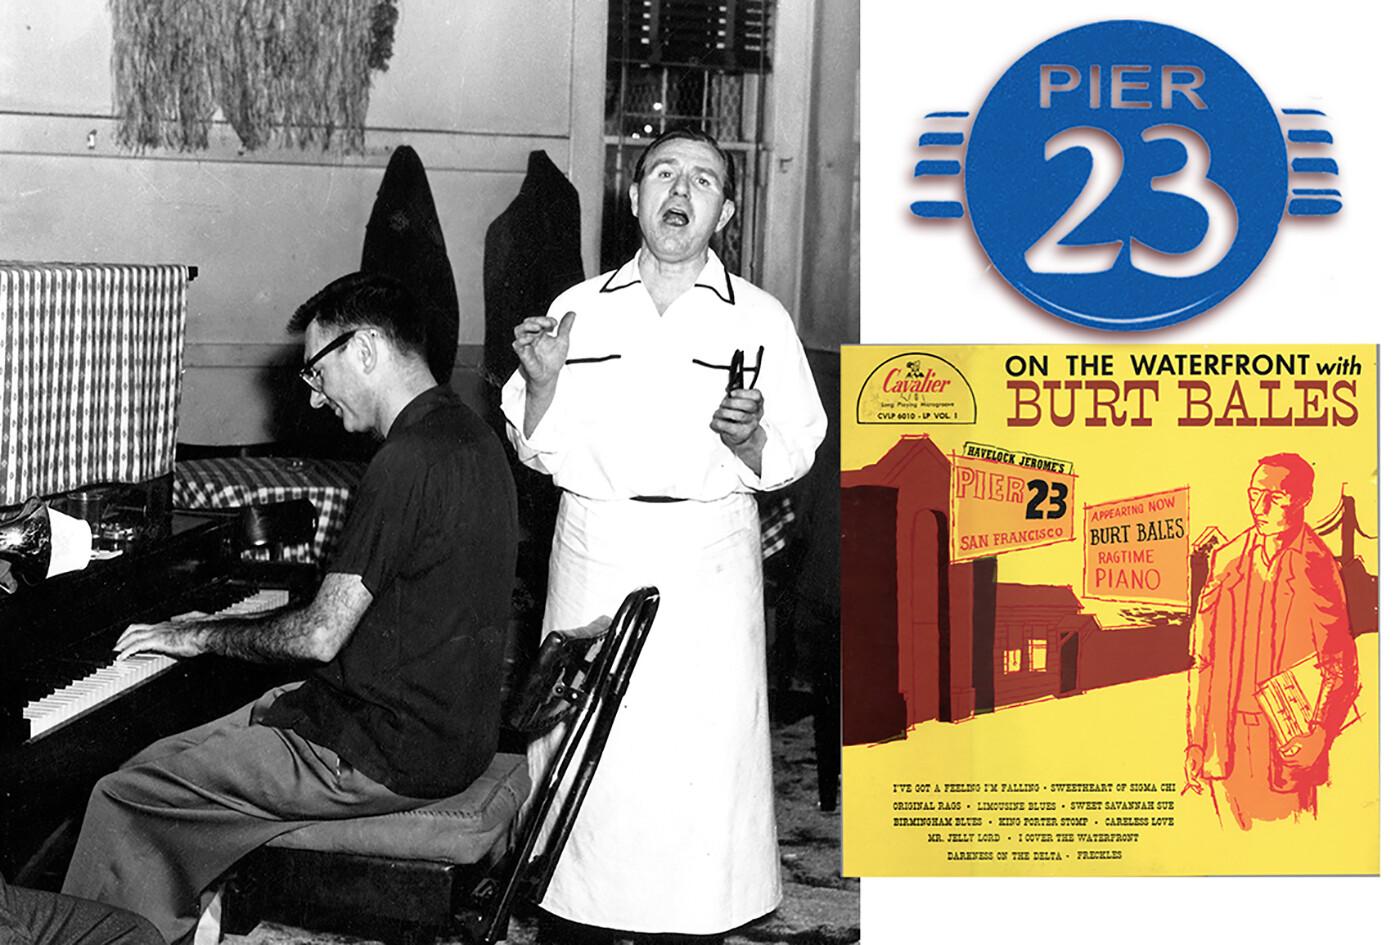 Burt Bales with Pier 23 proprietor, Hadlock Jerome